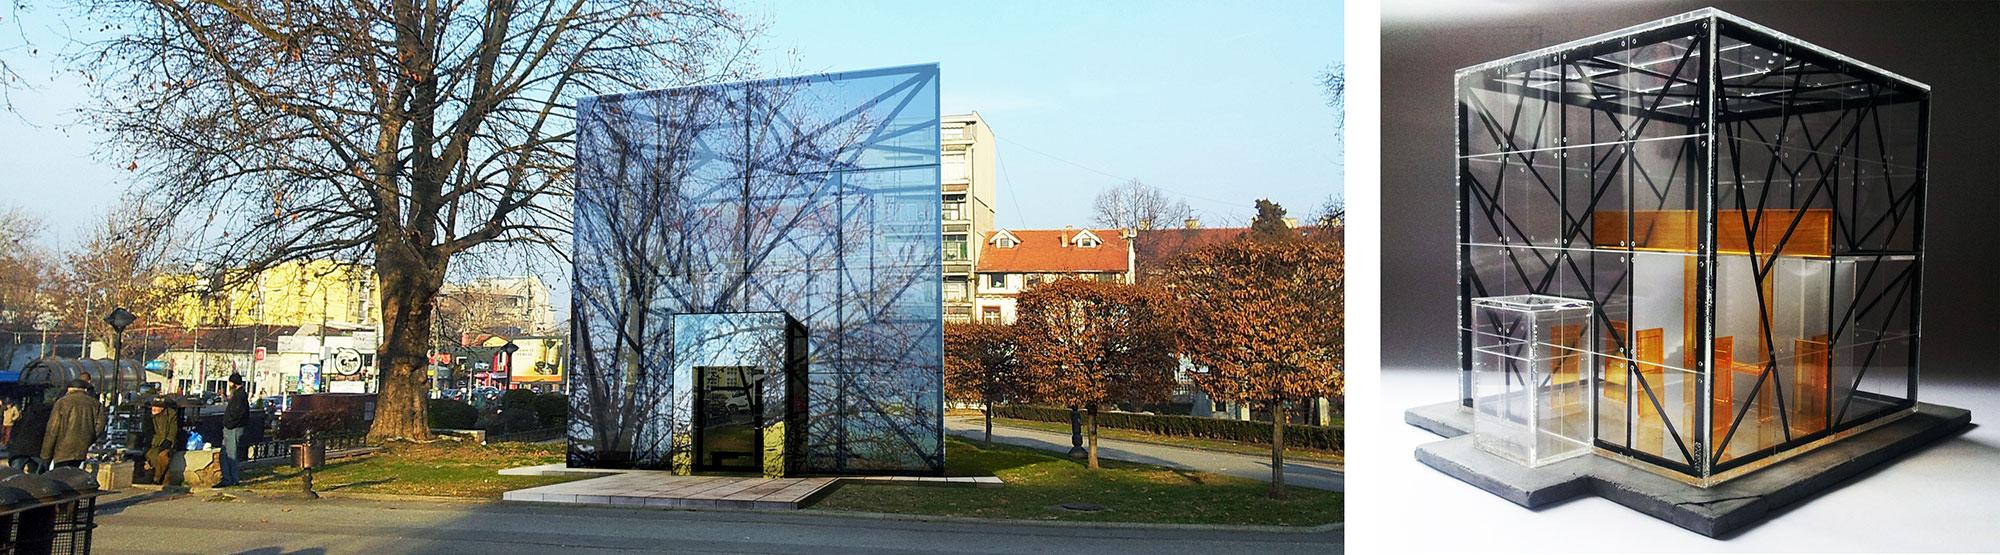 Saint-Gobain-Glass_SP_III_nagrada